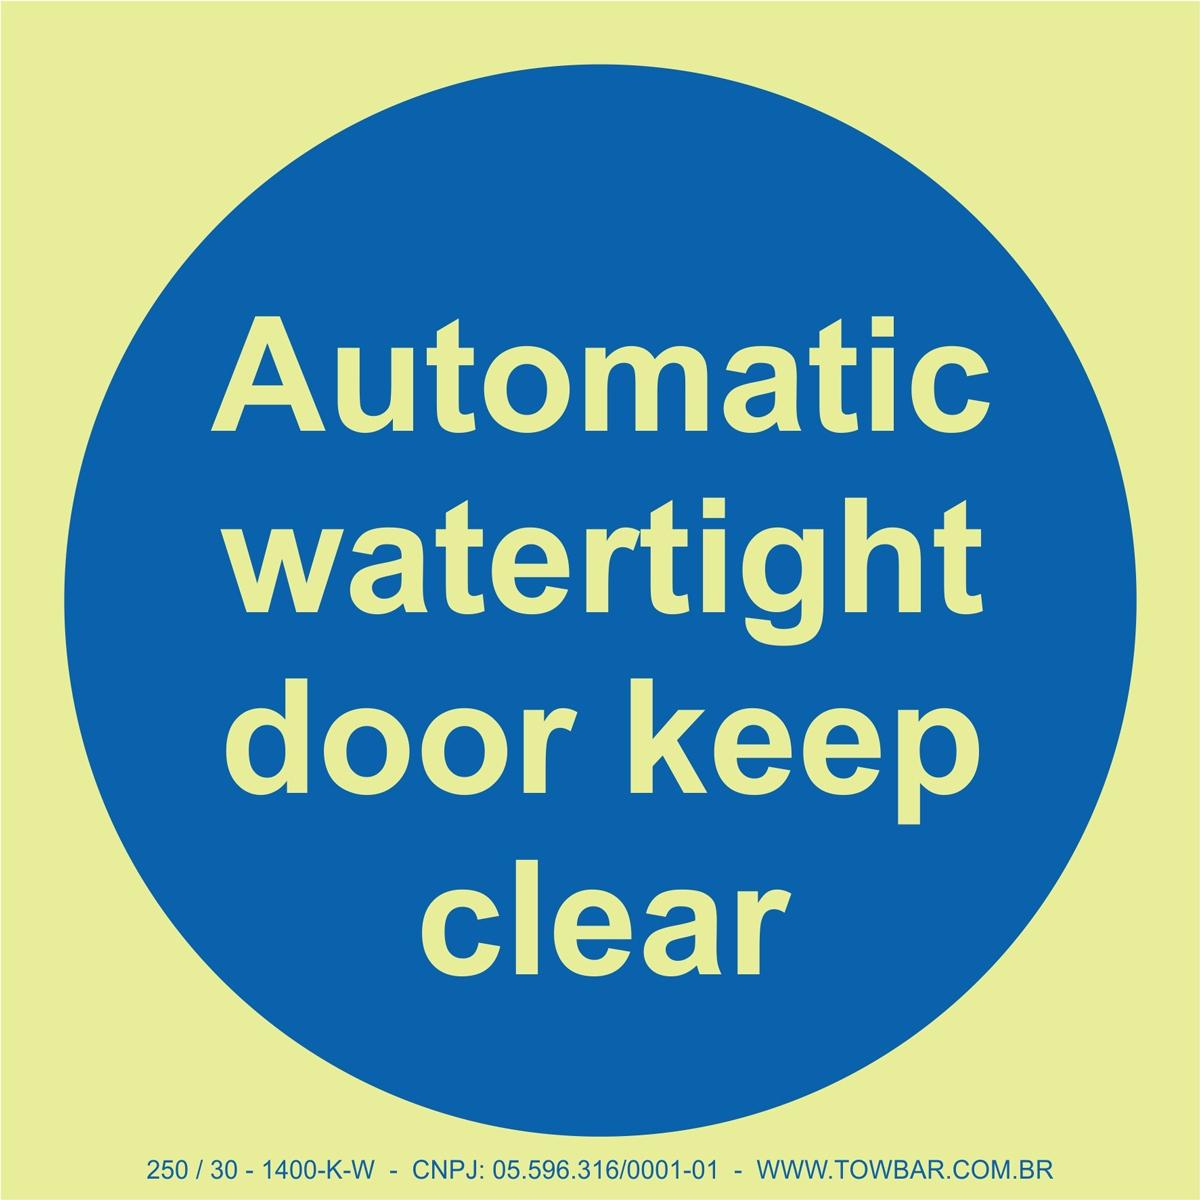 Automatic Waterlight Door Keep Clear   - Towbar Sinalização de Segurança